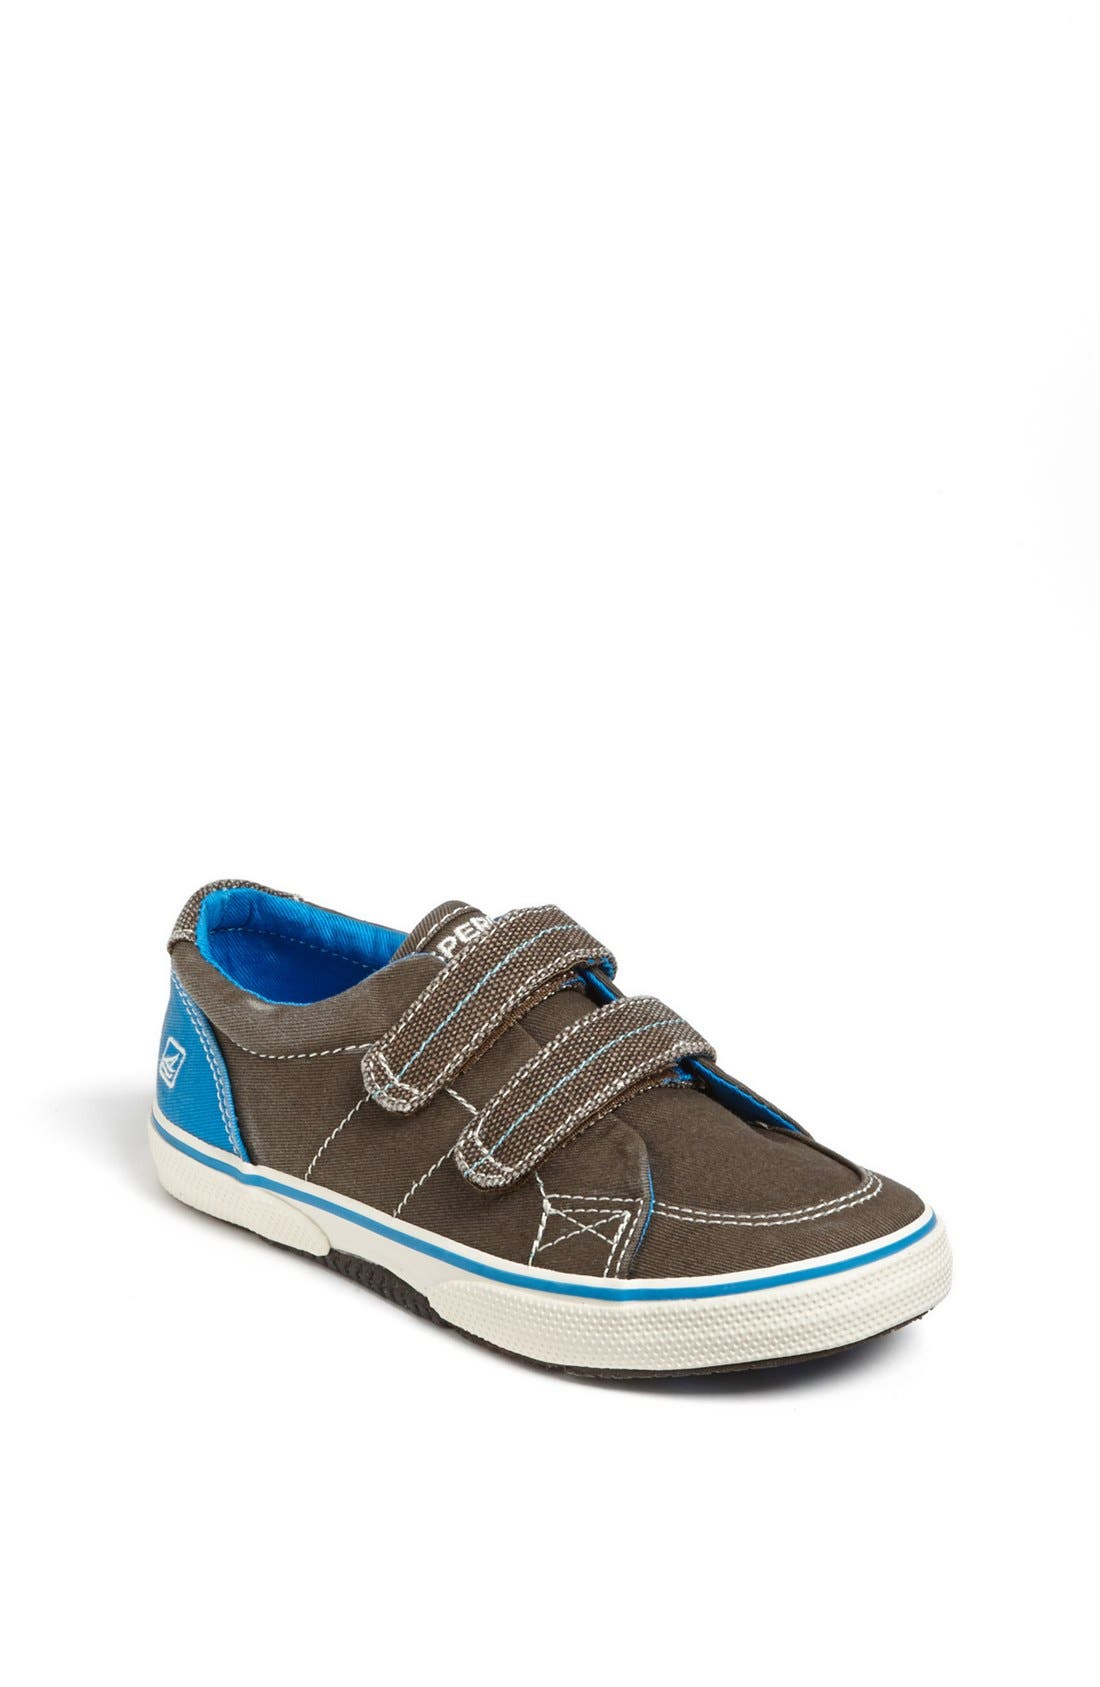 Alternate Image 1 Selected - Sperry Kids 'Halyard' Sneaker (Walker & Toddler)